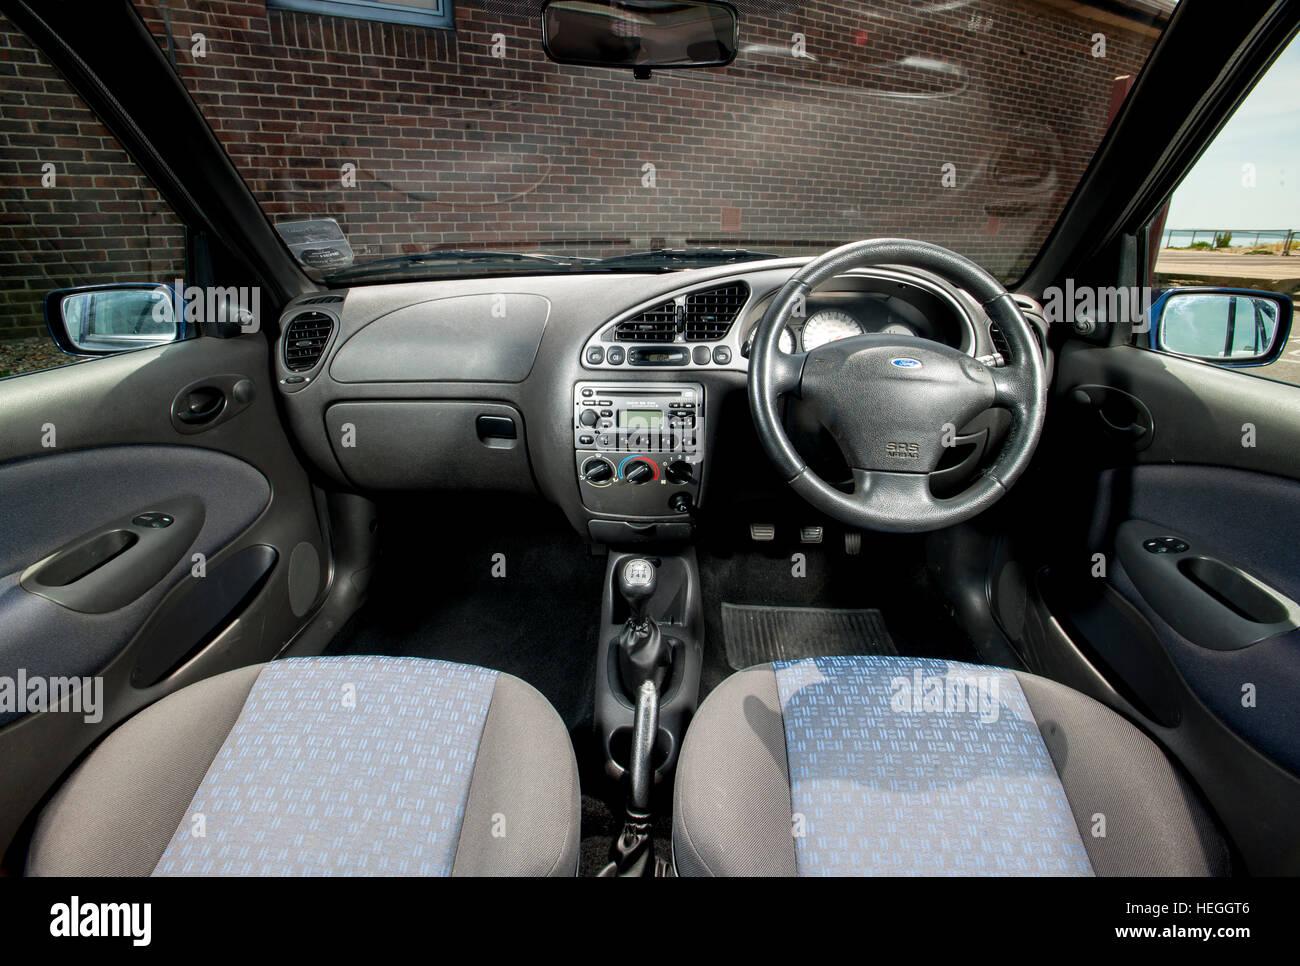 2002 Mk5 Ford Fiesta Small Hatchback Car Interior